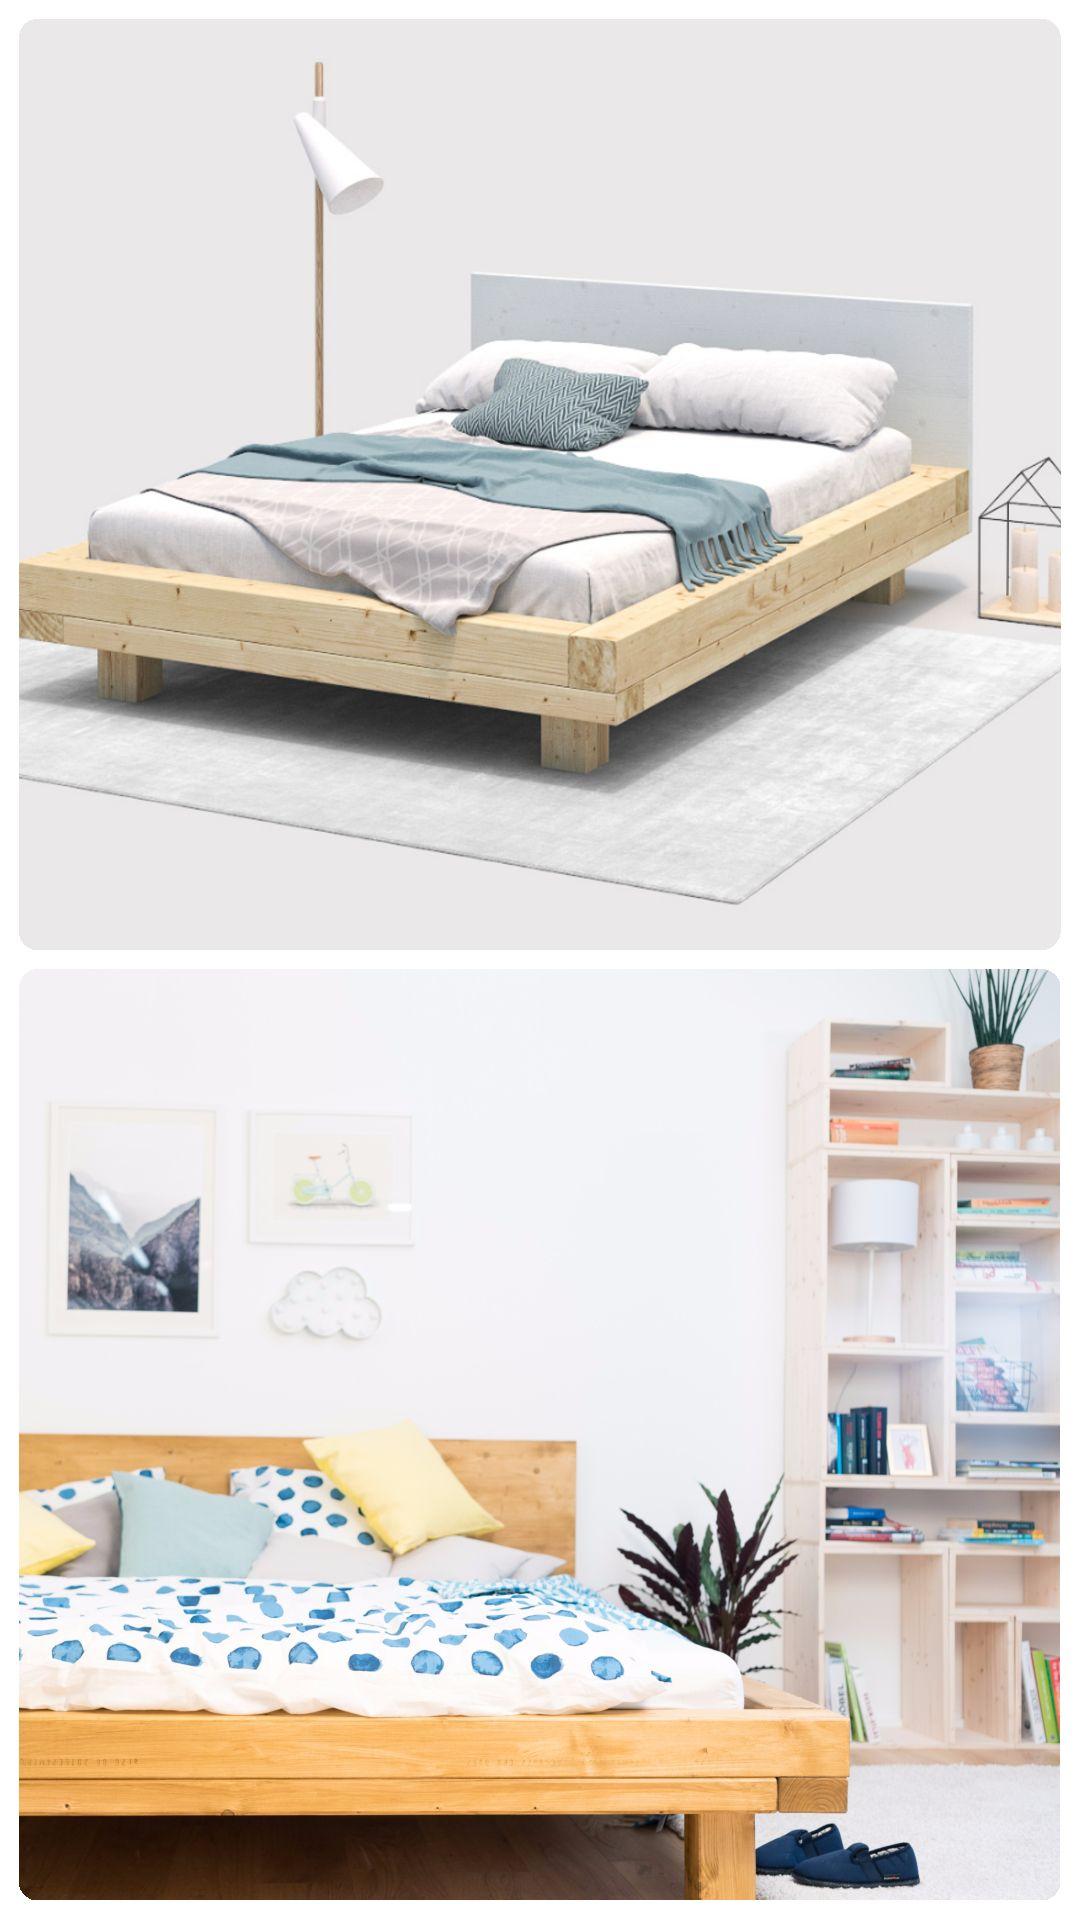 bett ludwig selber bauen betten in 2019 obi selbstbaum bel pinterest bett schlafzimmer. Black Bedroom Furniture Sets. Home Design Ideas